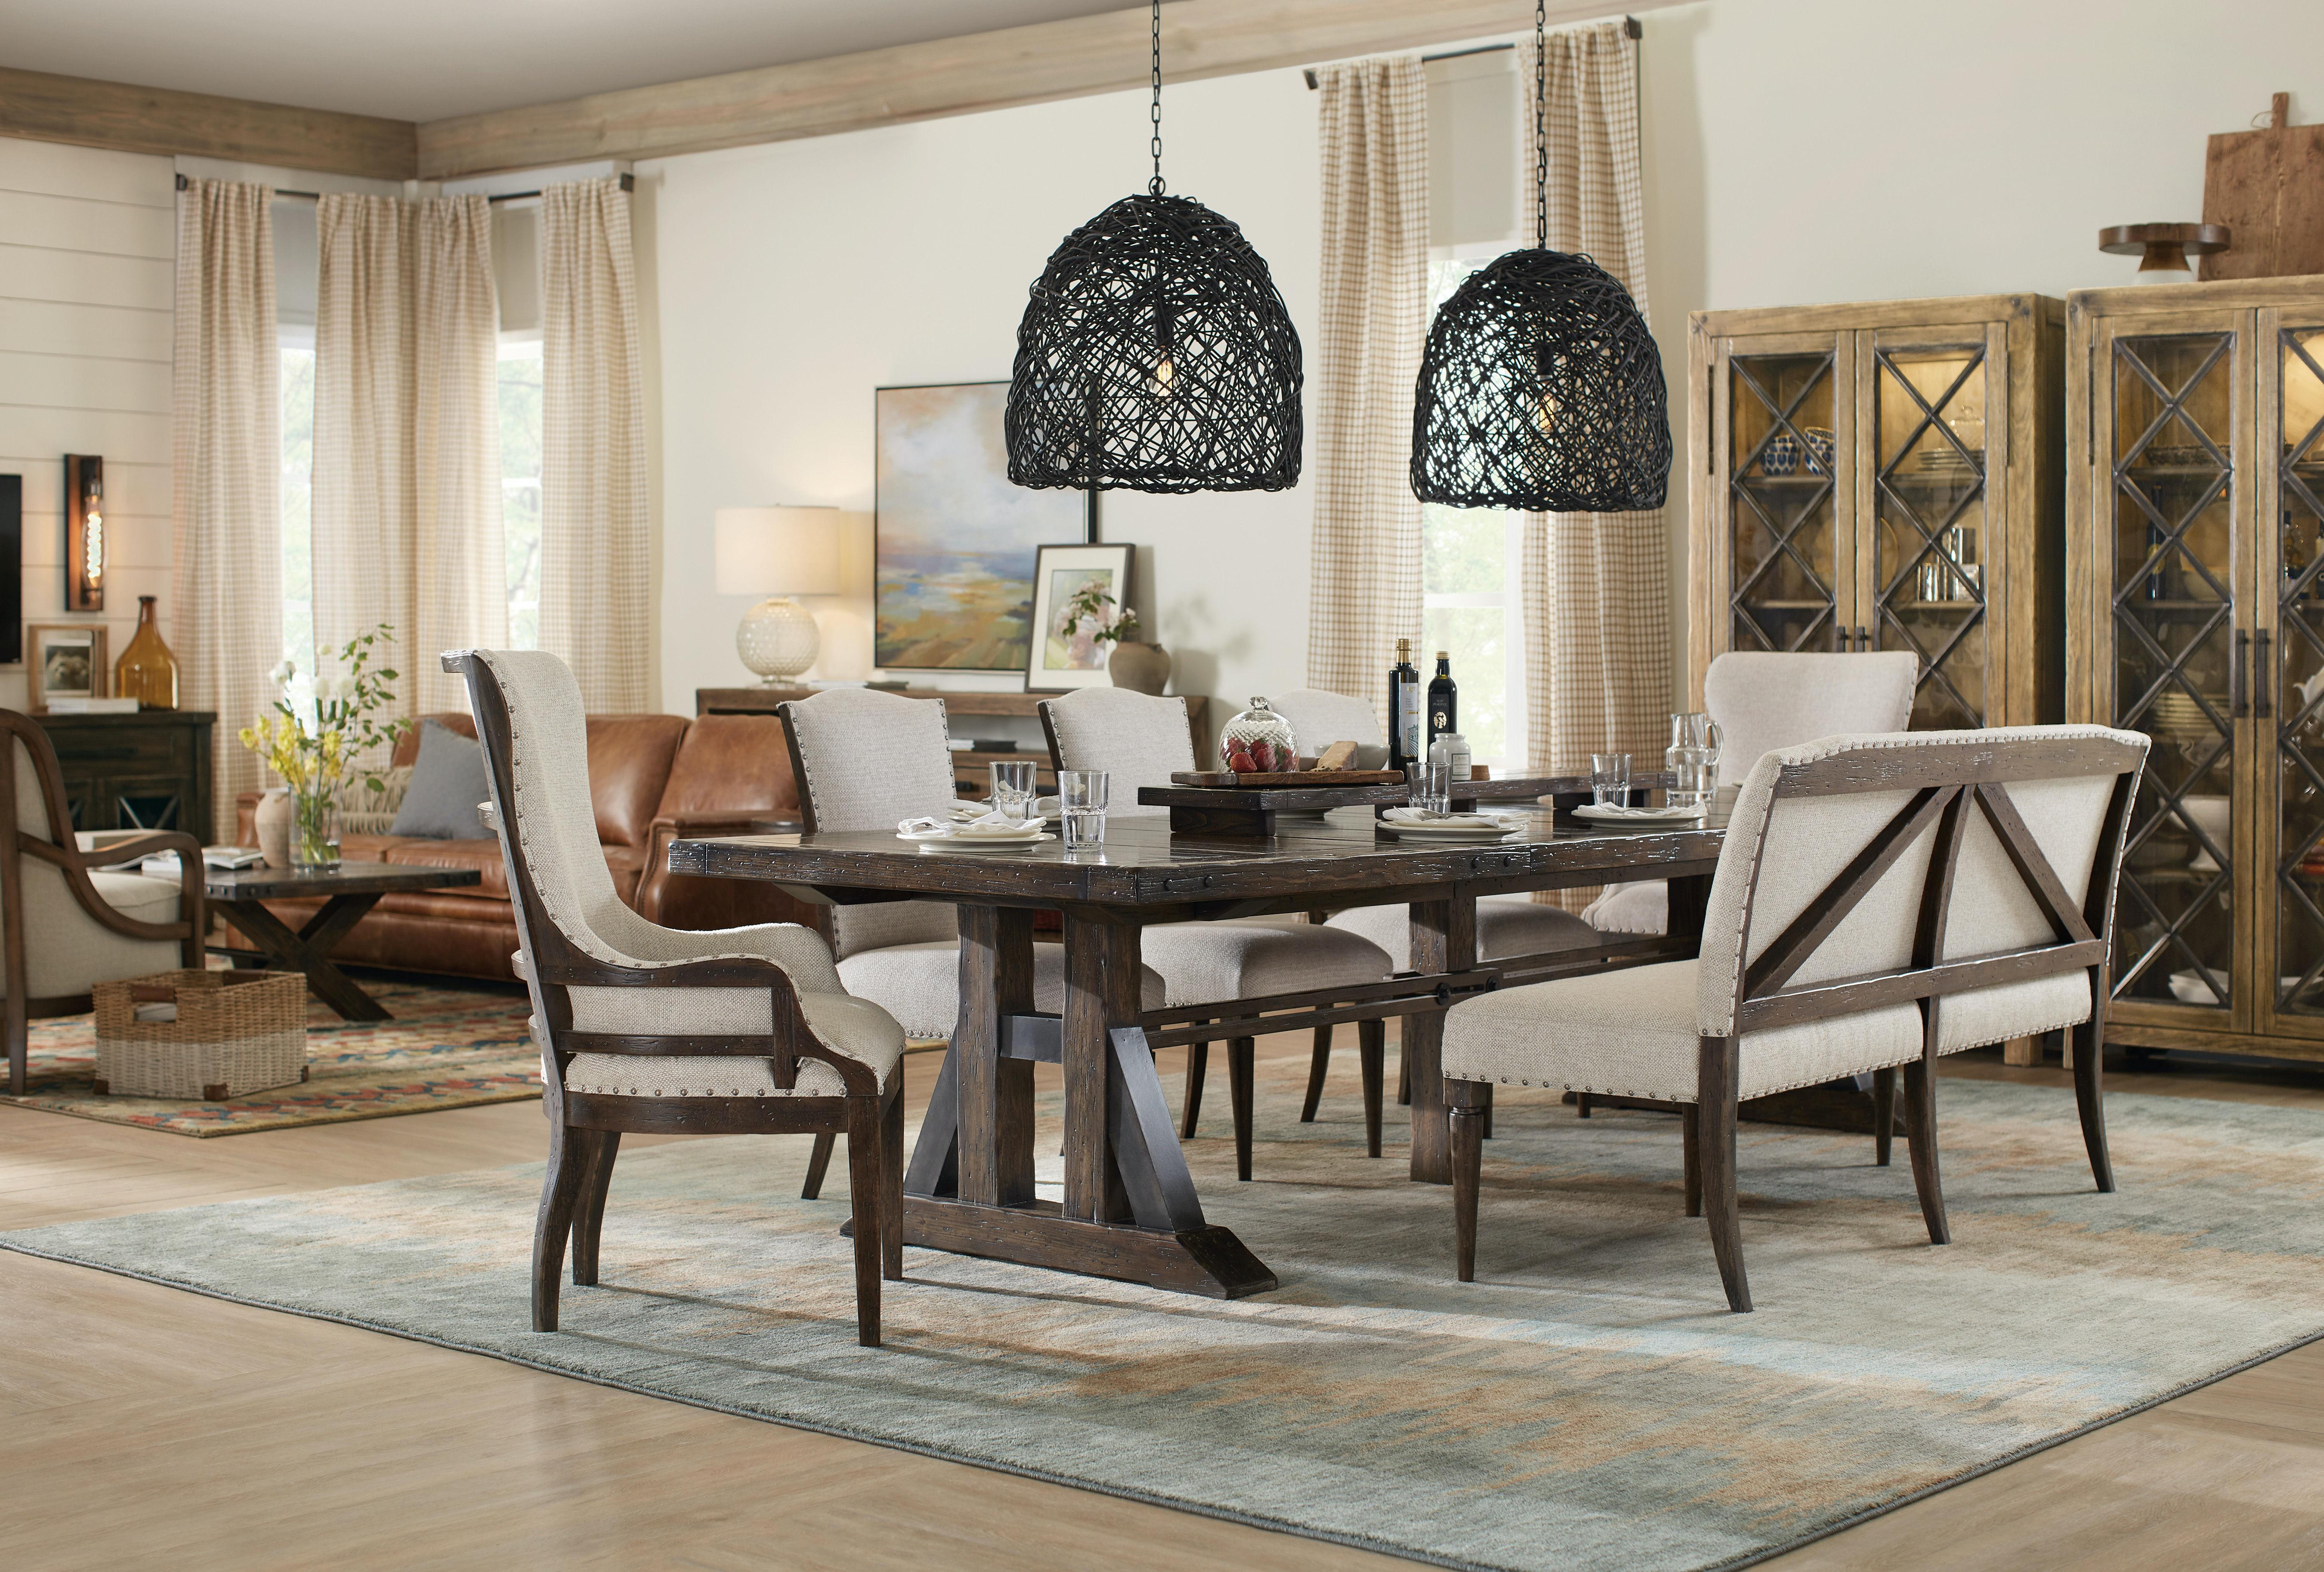 Hooker Furniture Roslyn County Trestle Dining Table W/2 21in Leaves  1618 75207